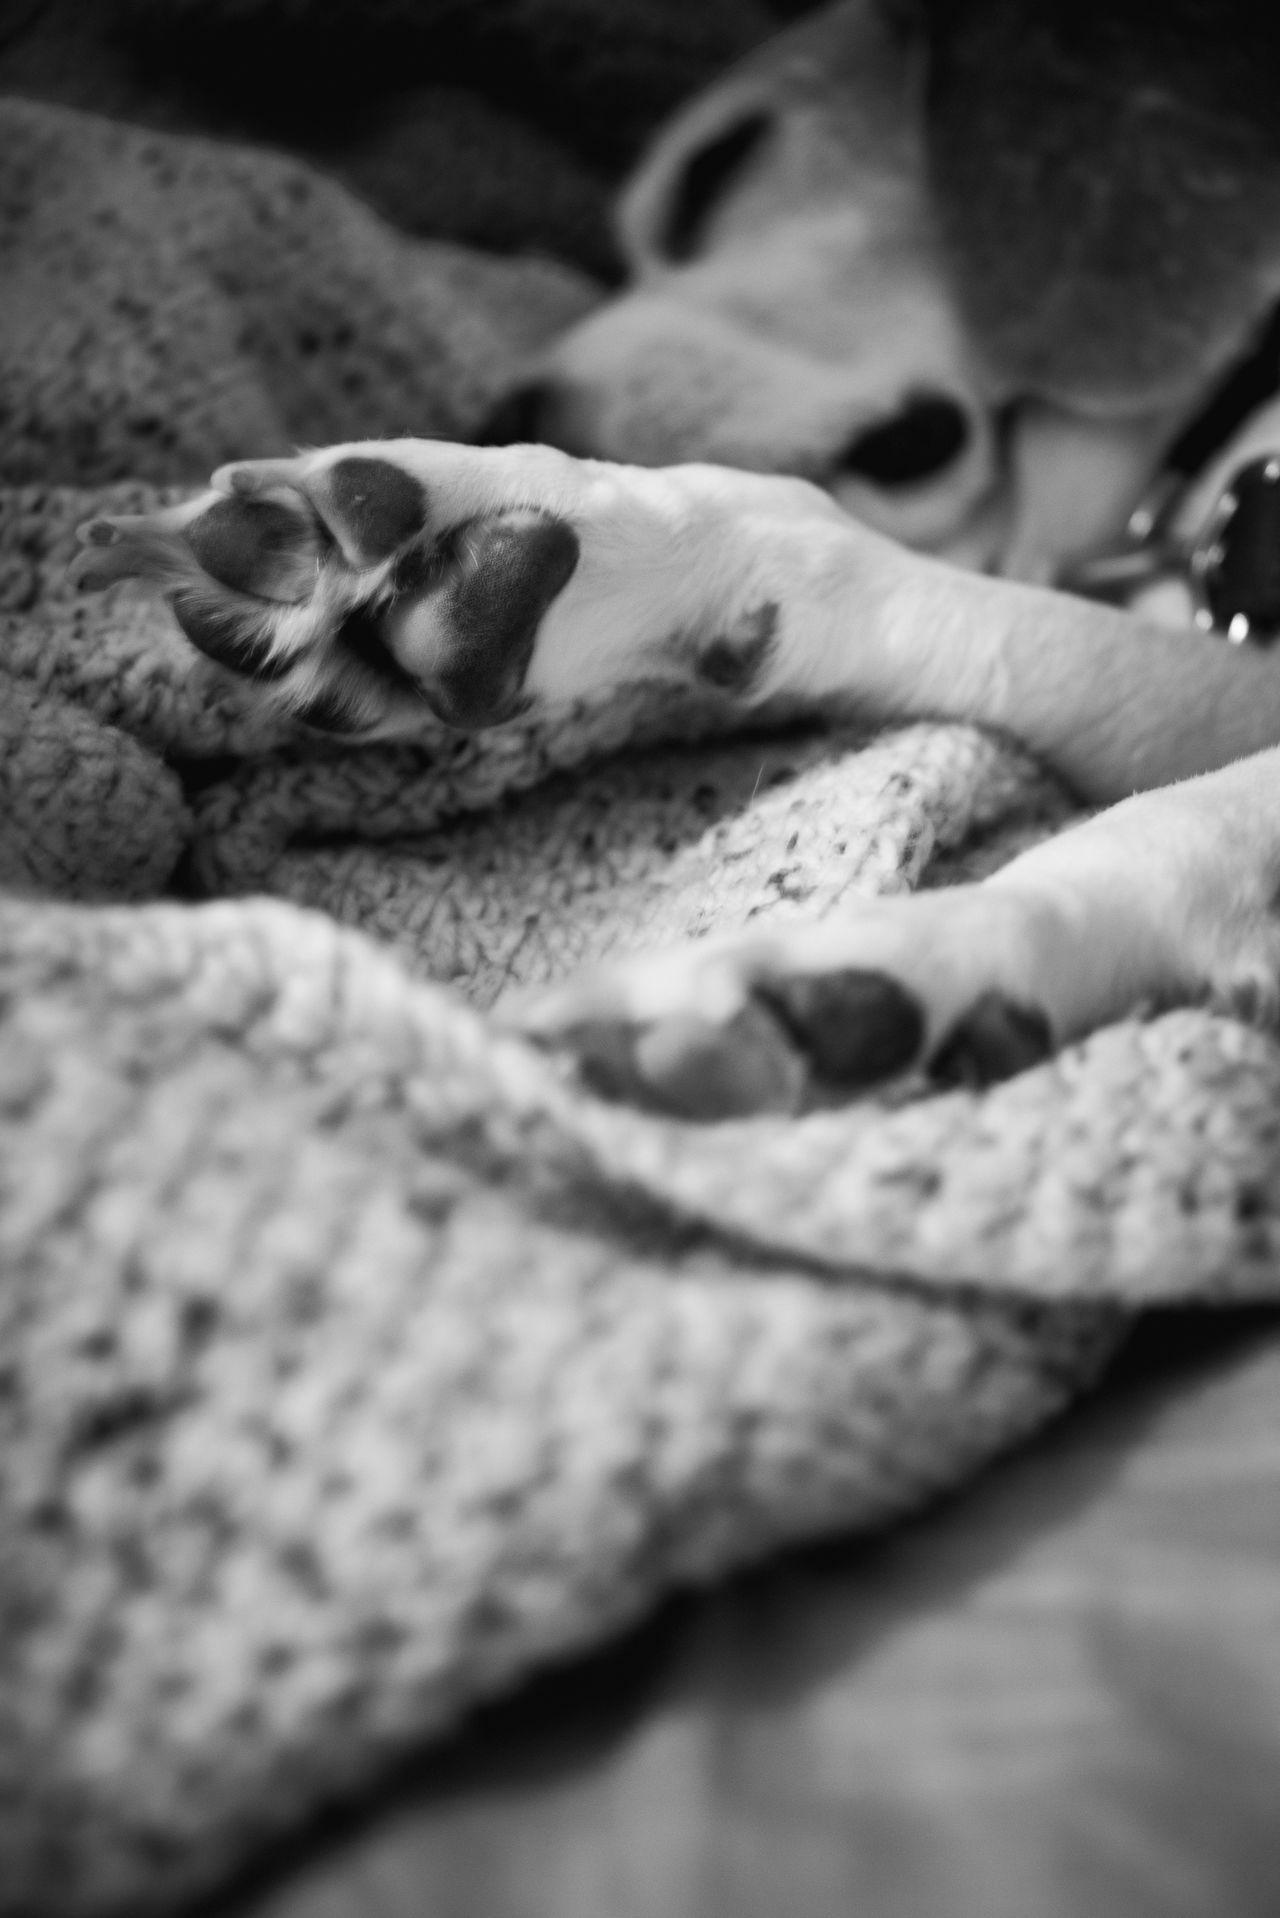 Beagle Beagle Love Beagle Paw Dog Black And White Photography Dog Paw Dog Photography Dog Portrait Dog Portraiture Dog Sleeping  Dog Sleeping In Bed Let Sleeping Dogs Lie No People Pet Photography  Pet Portraits Pet Portraiture Sleeping Beagle Pet Lifestyle Dog Lifestyle